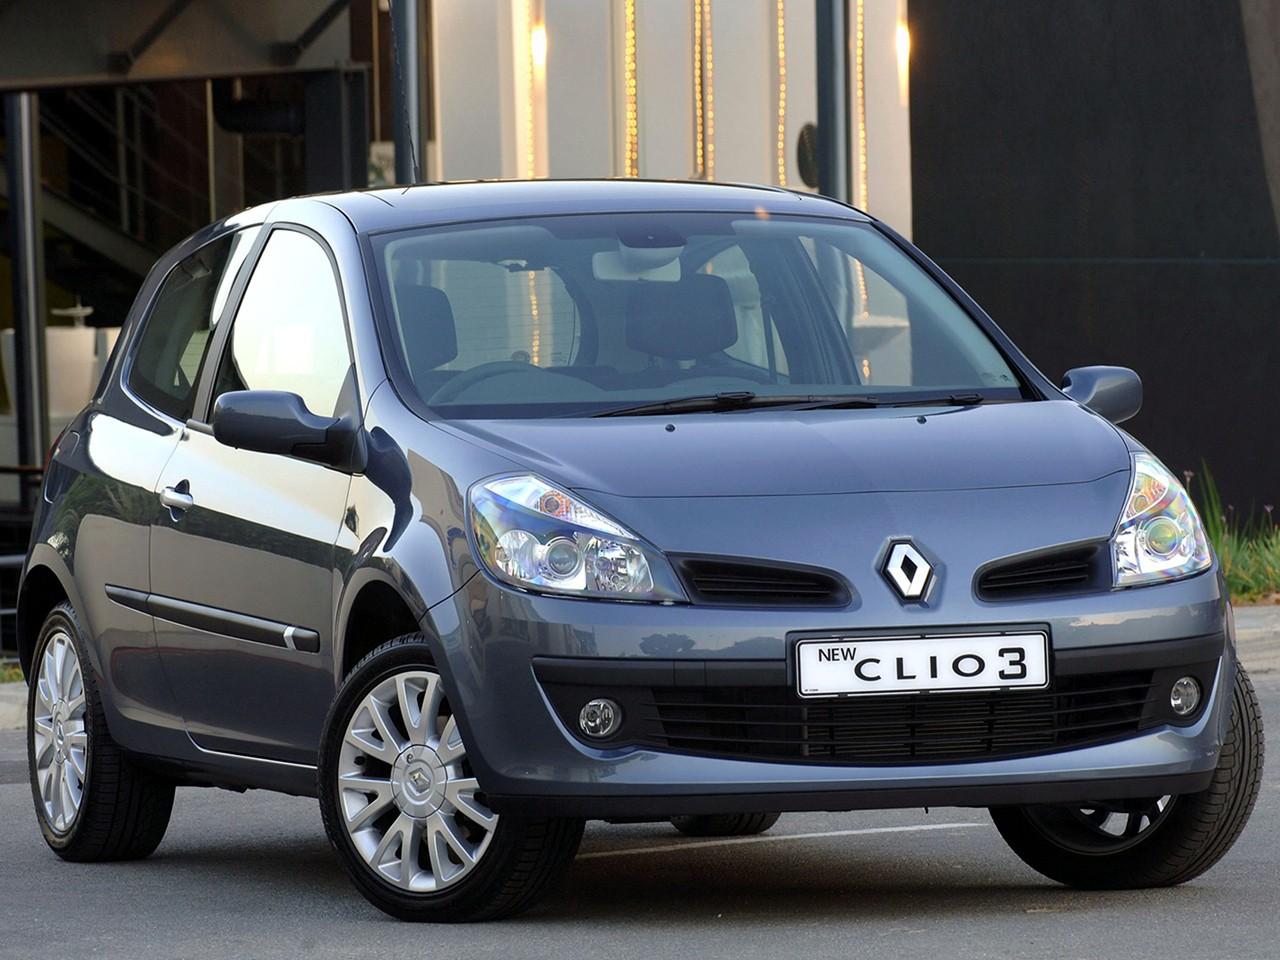 Dacia Pickup 2017 >> RENAULT Clio 3 Doors specs & photos - 2006, 2007, 2008, 2009 - autoevolution